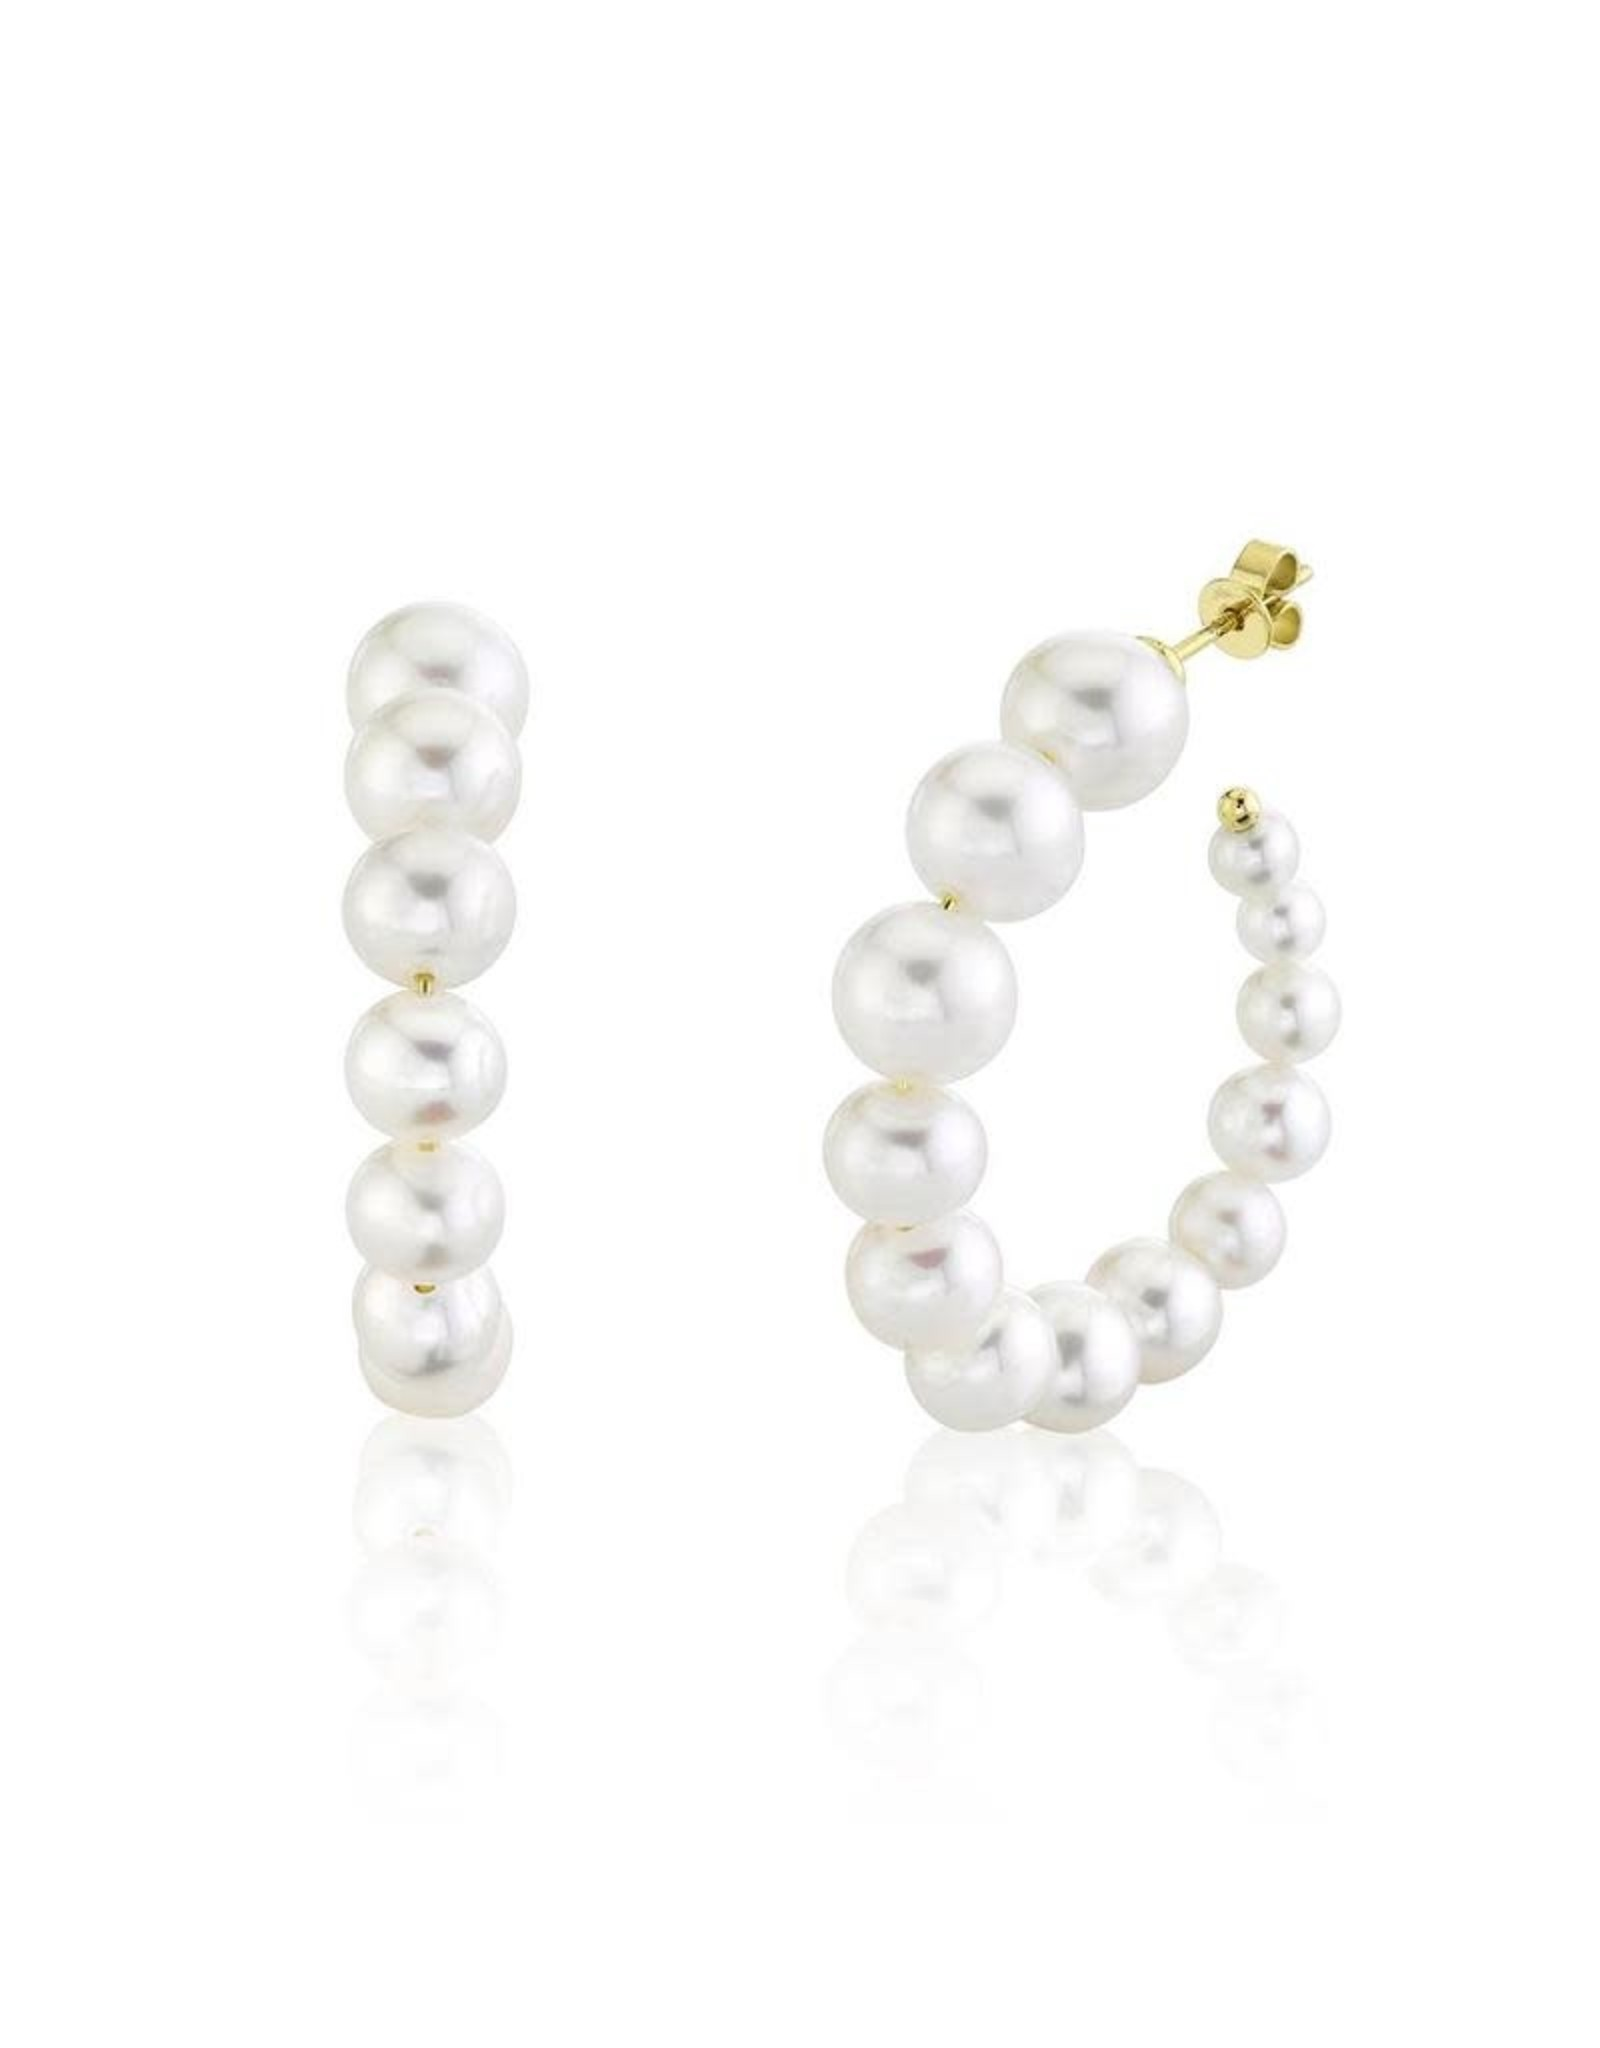 14K Yellow Gold Graduated Pearl Hoop Earrings